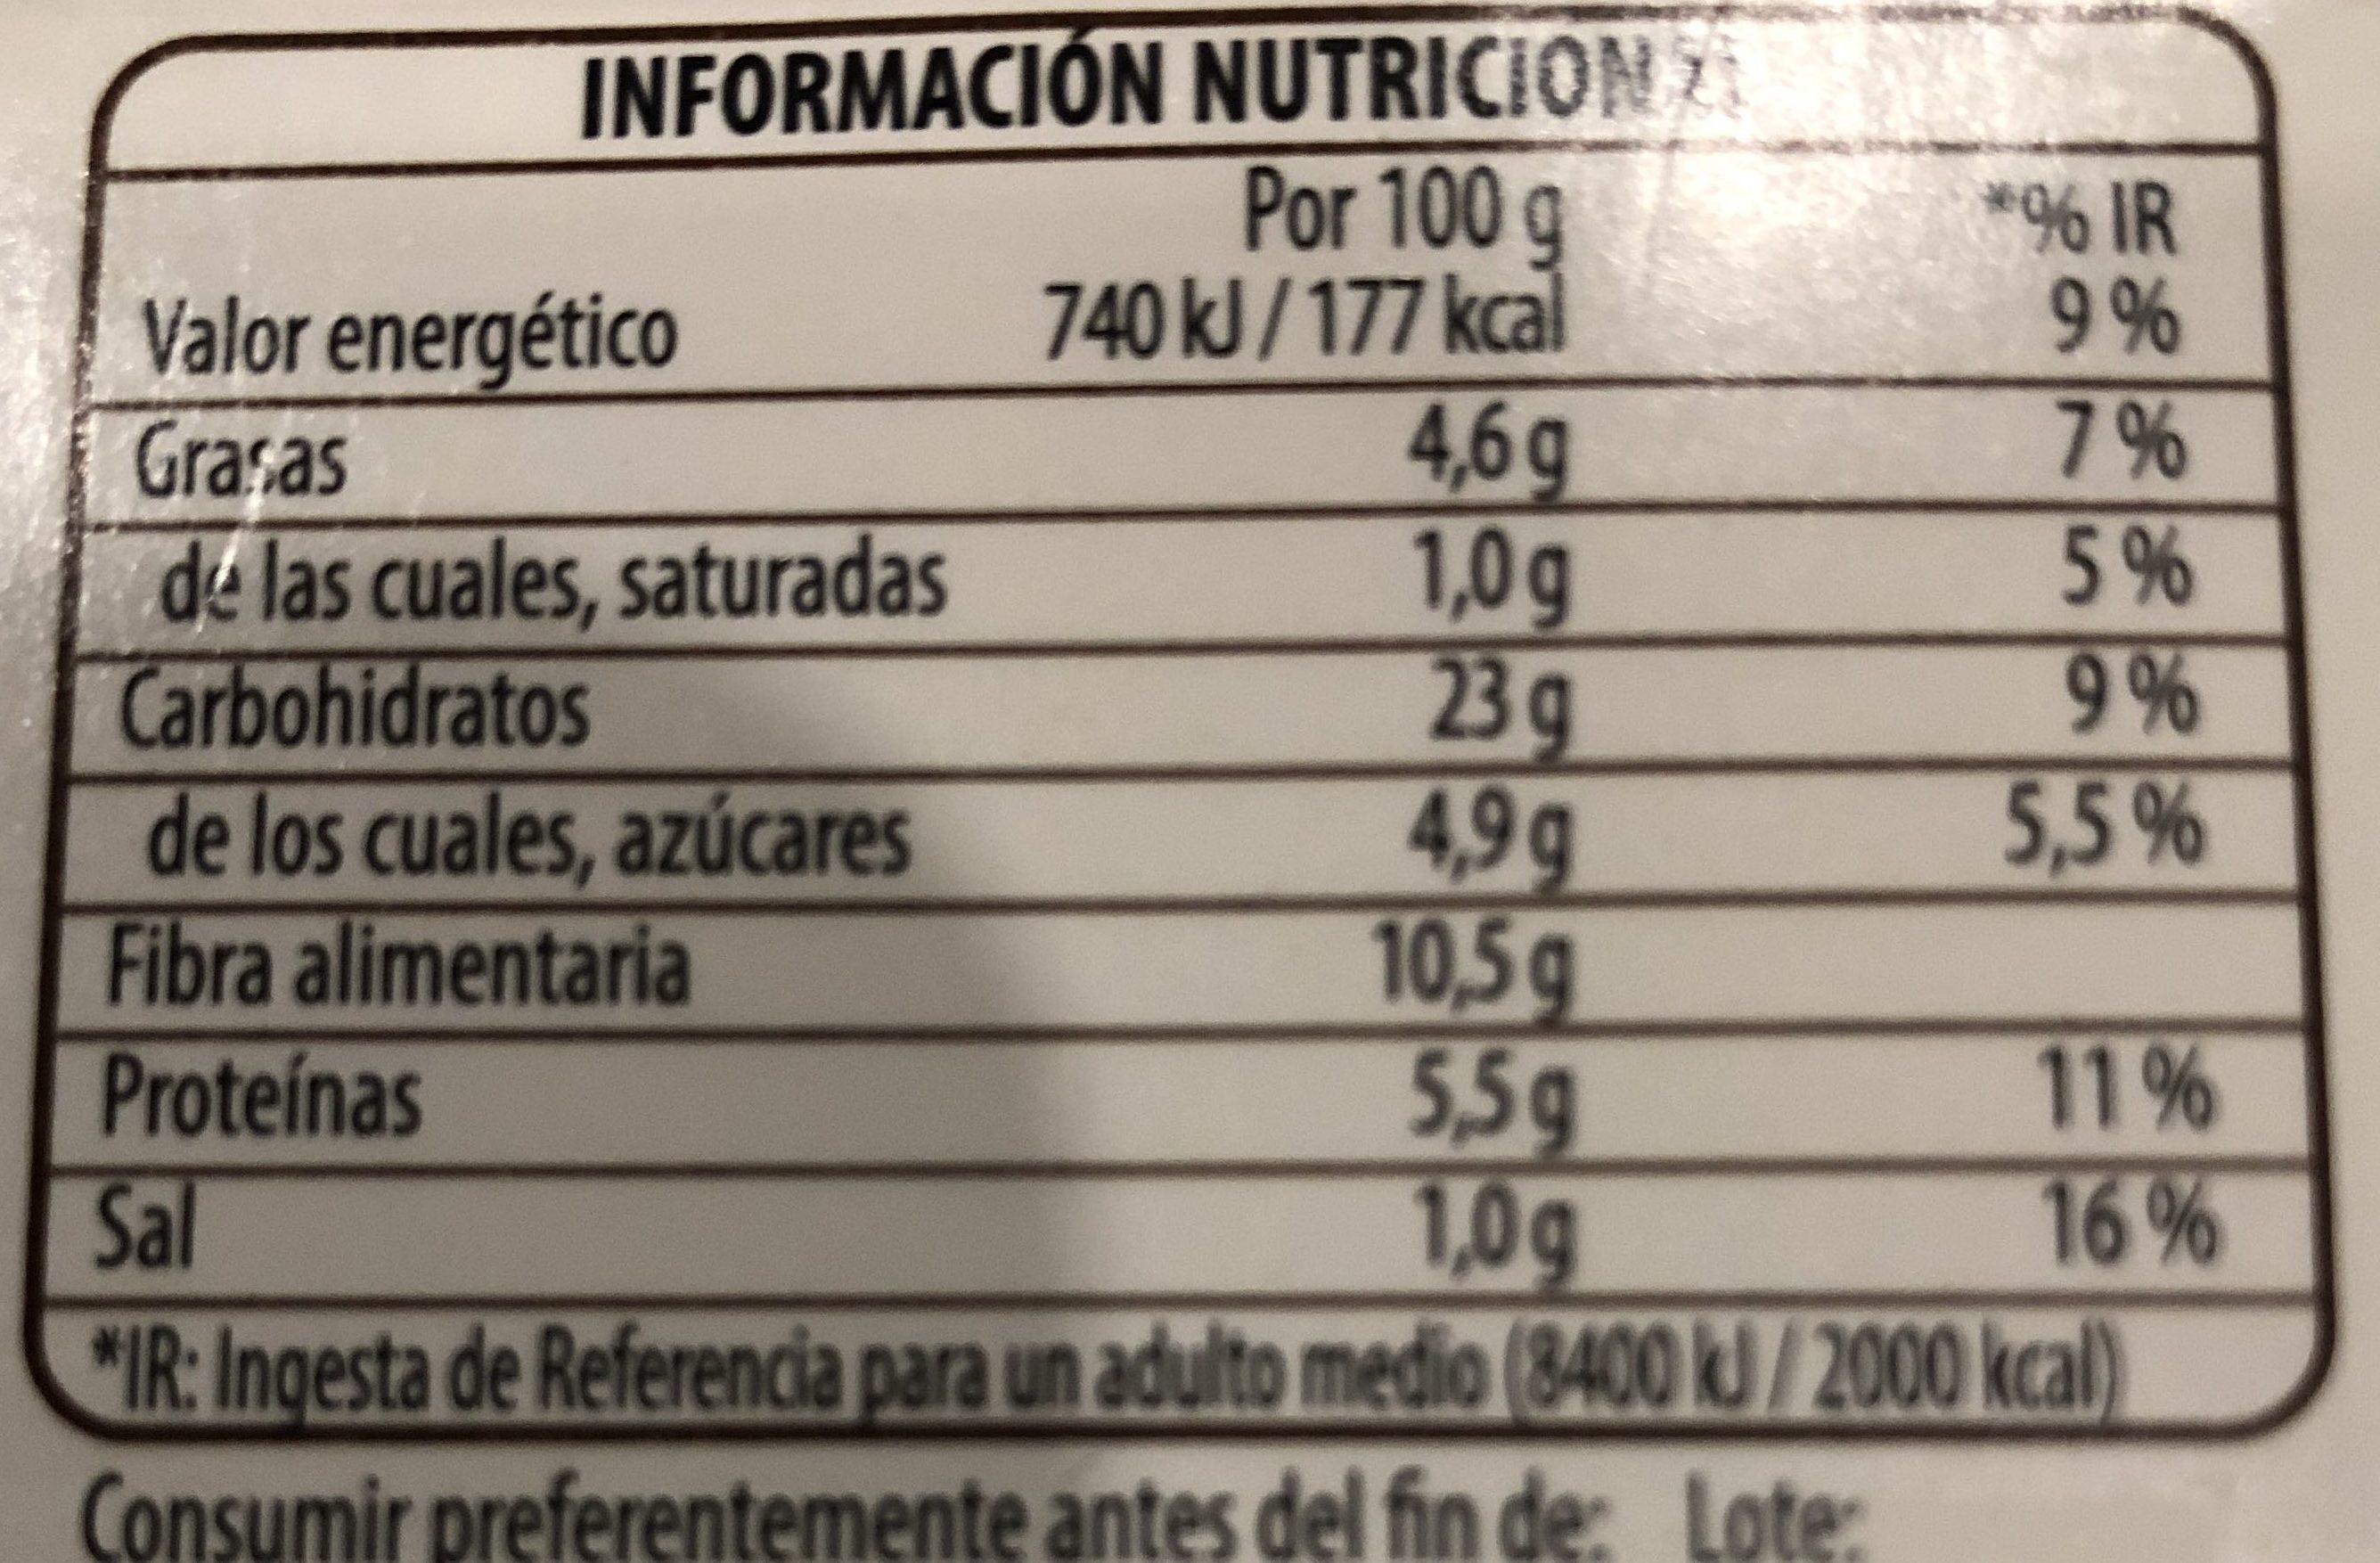 Benefit cous cous quinoa verduras - Información nutricional - es